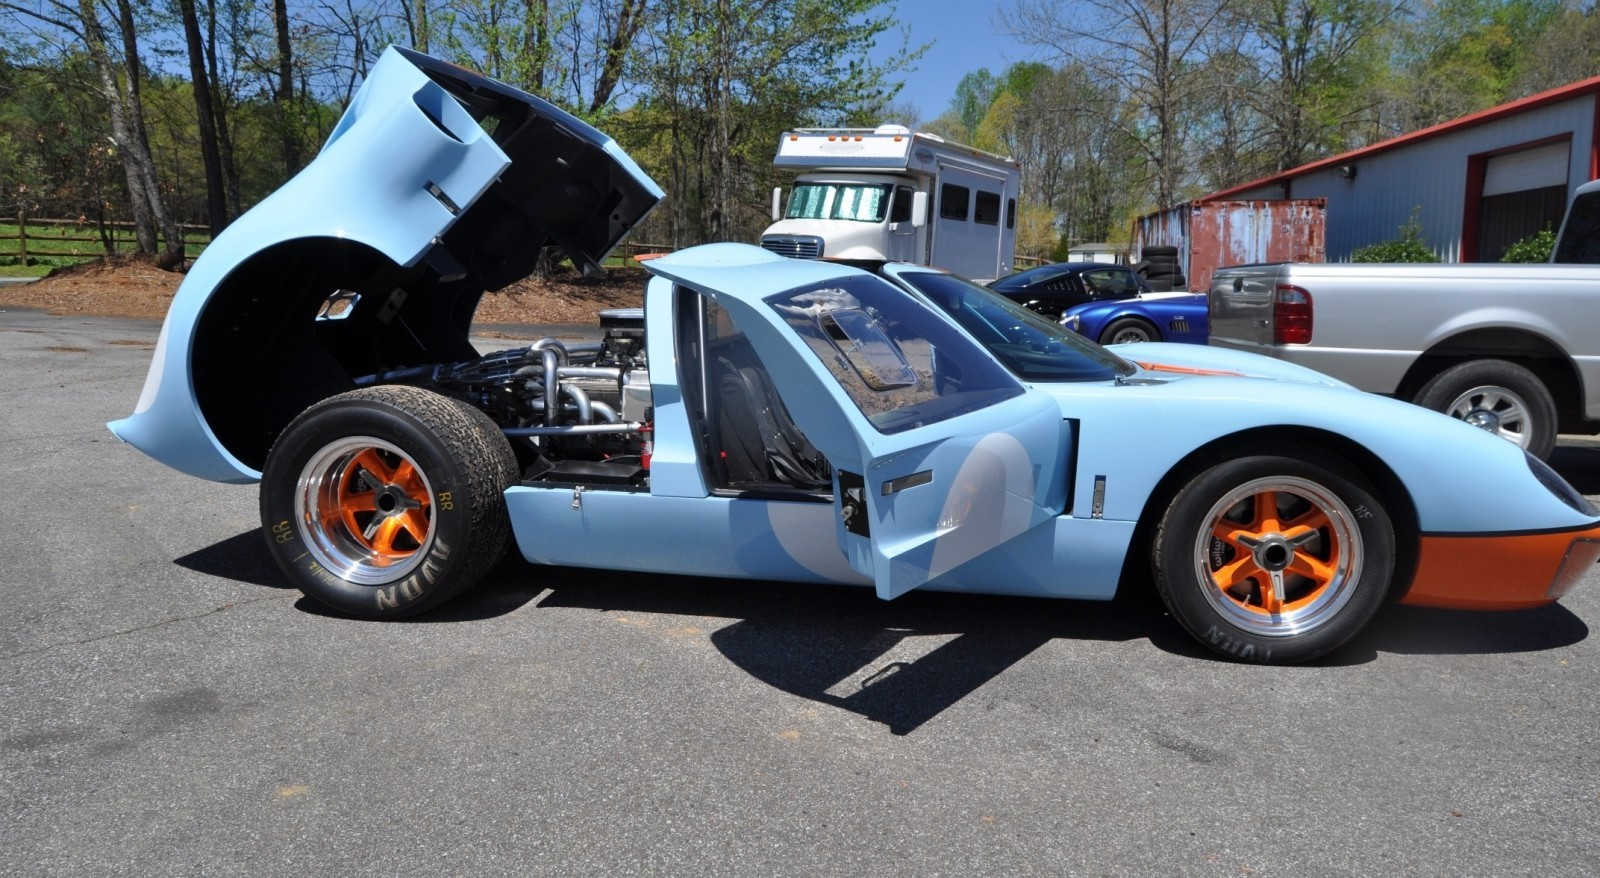 2014 Superformance GT40 Mark I - MEGA Photo Shoot and Ride-Along Videos 72